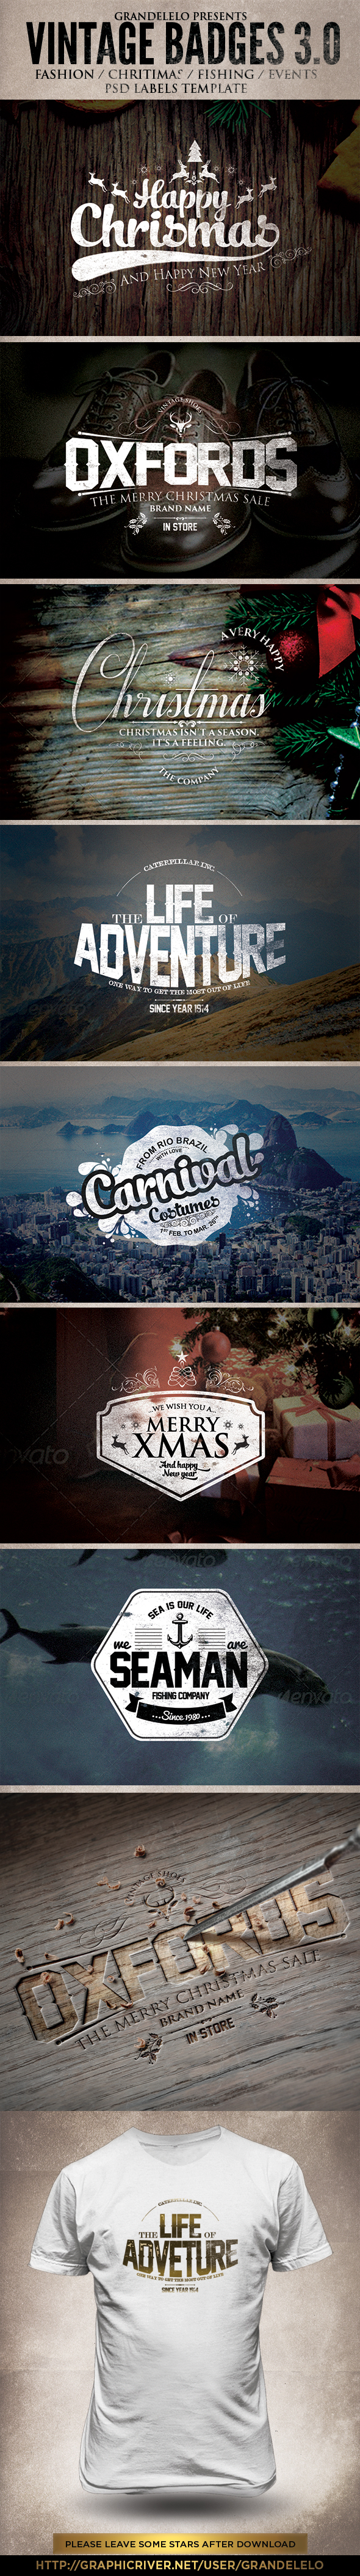 Christmas / Vintage / Badges 3.0 on Behance | Cool poster ...